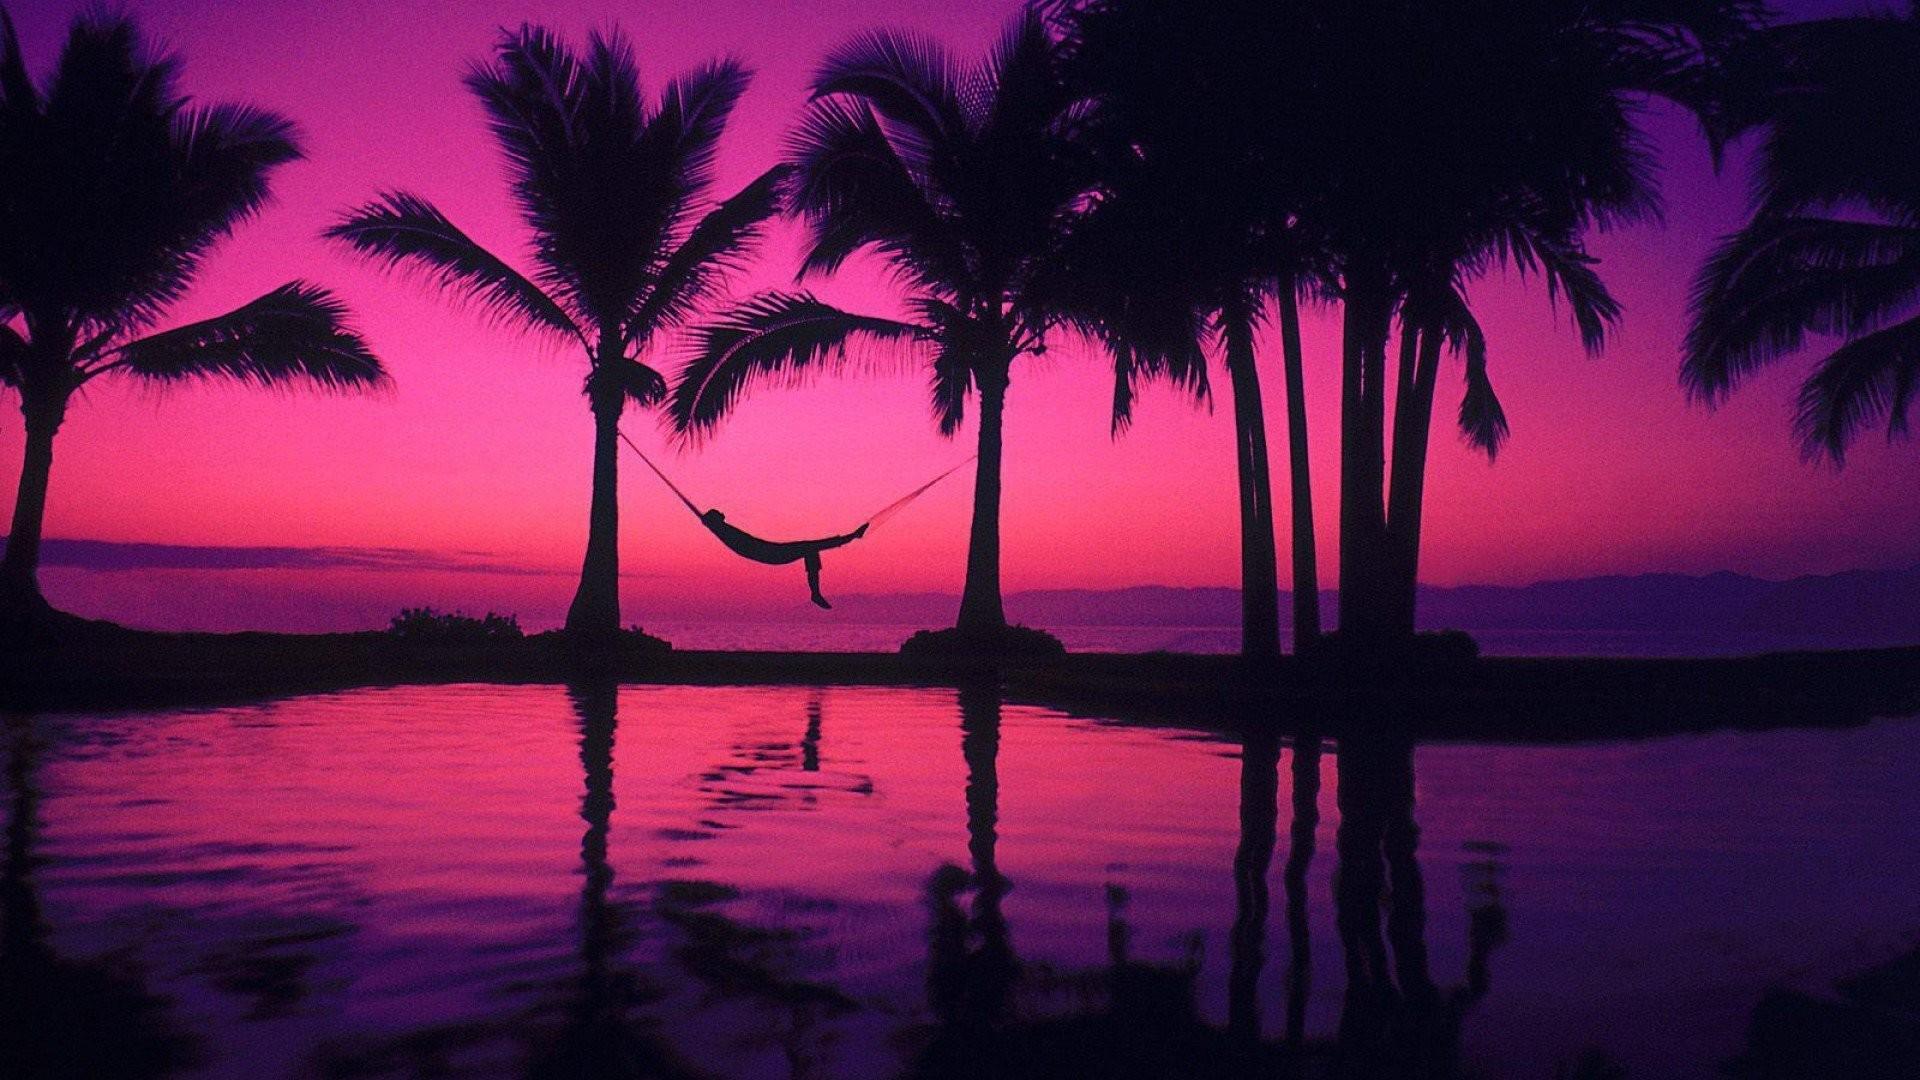 Pink Sunset Wallpaper image hd